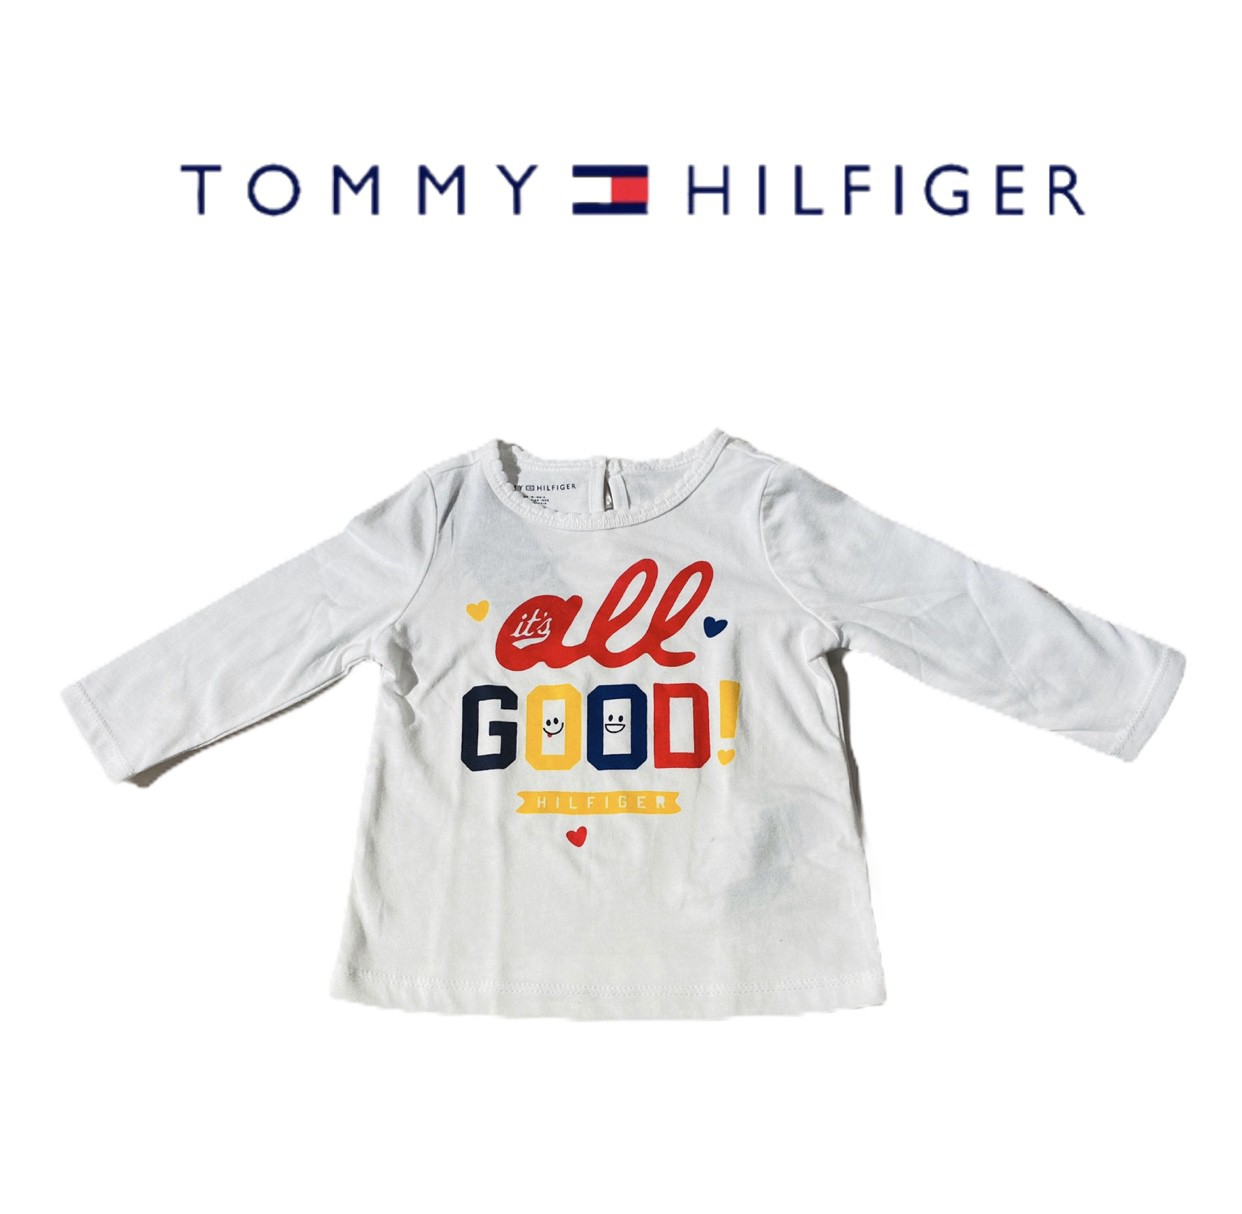 CAMISETA TOMMY HILFIGER® ALL GOOD